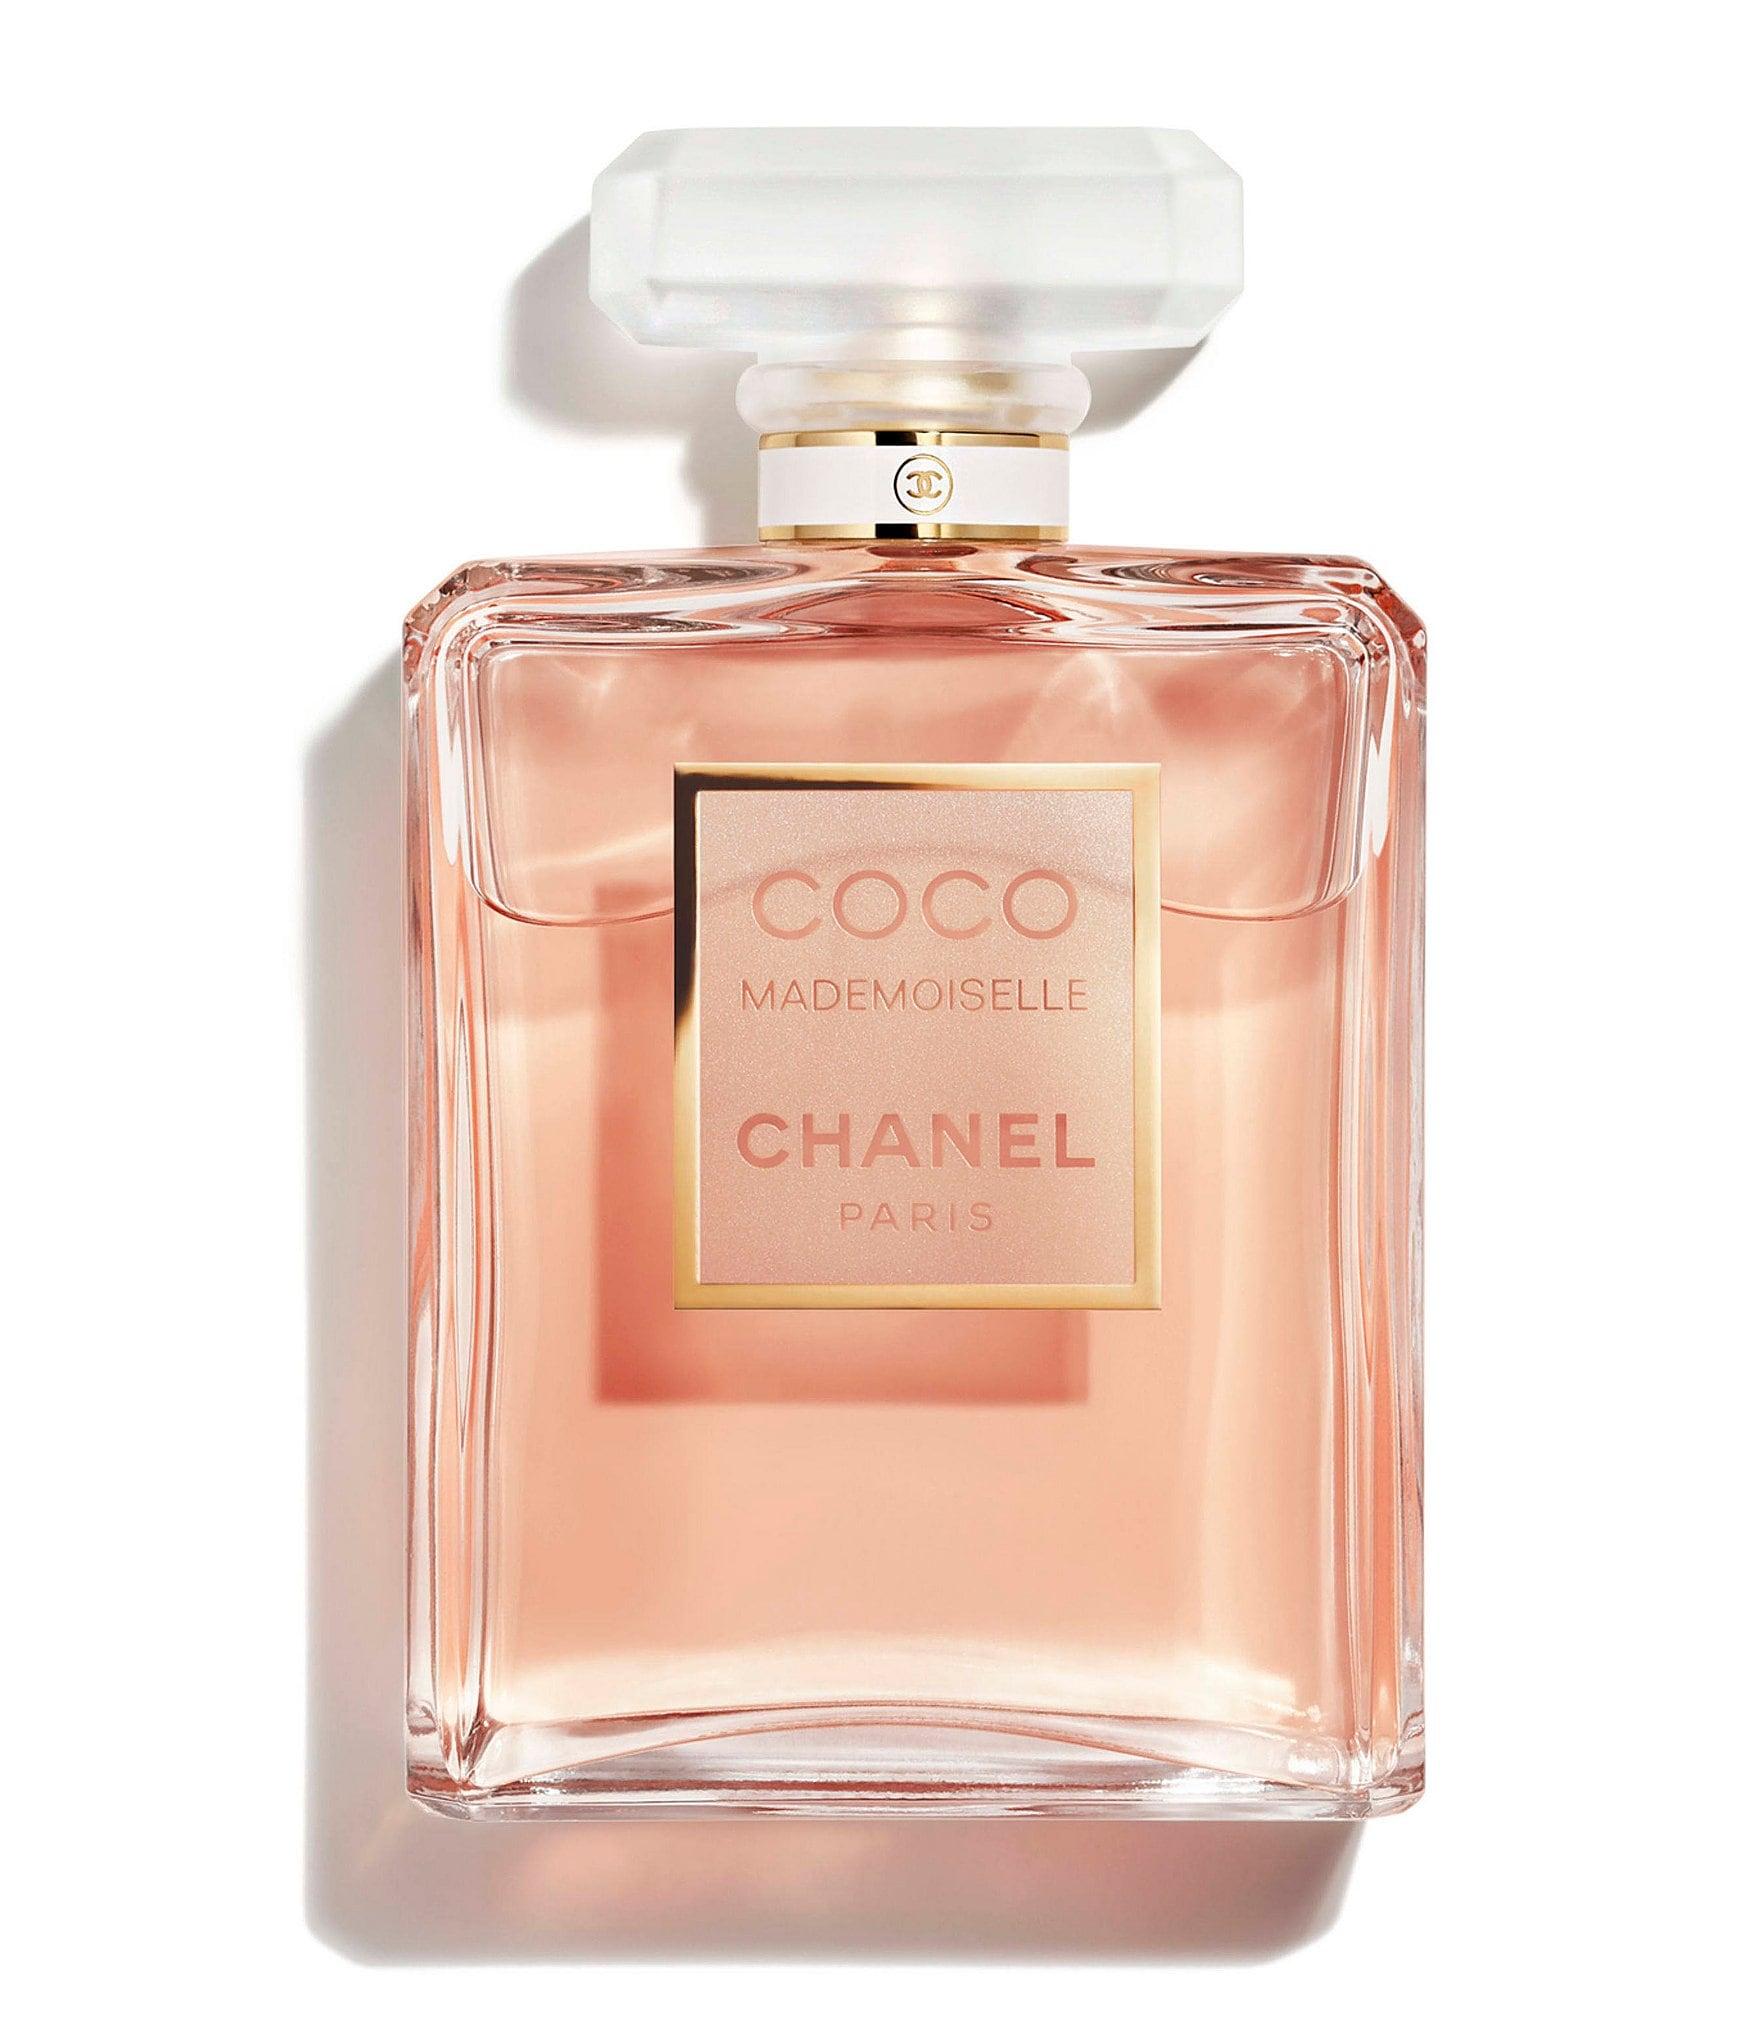 chanel chanel coco mademoiselle eau de parfum spray dillards. Black Bedroom Furniture Sets. Home Design Ideas